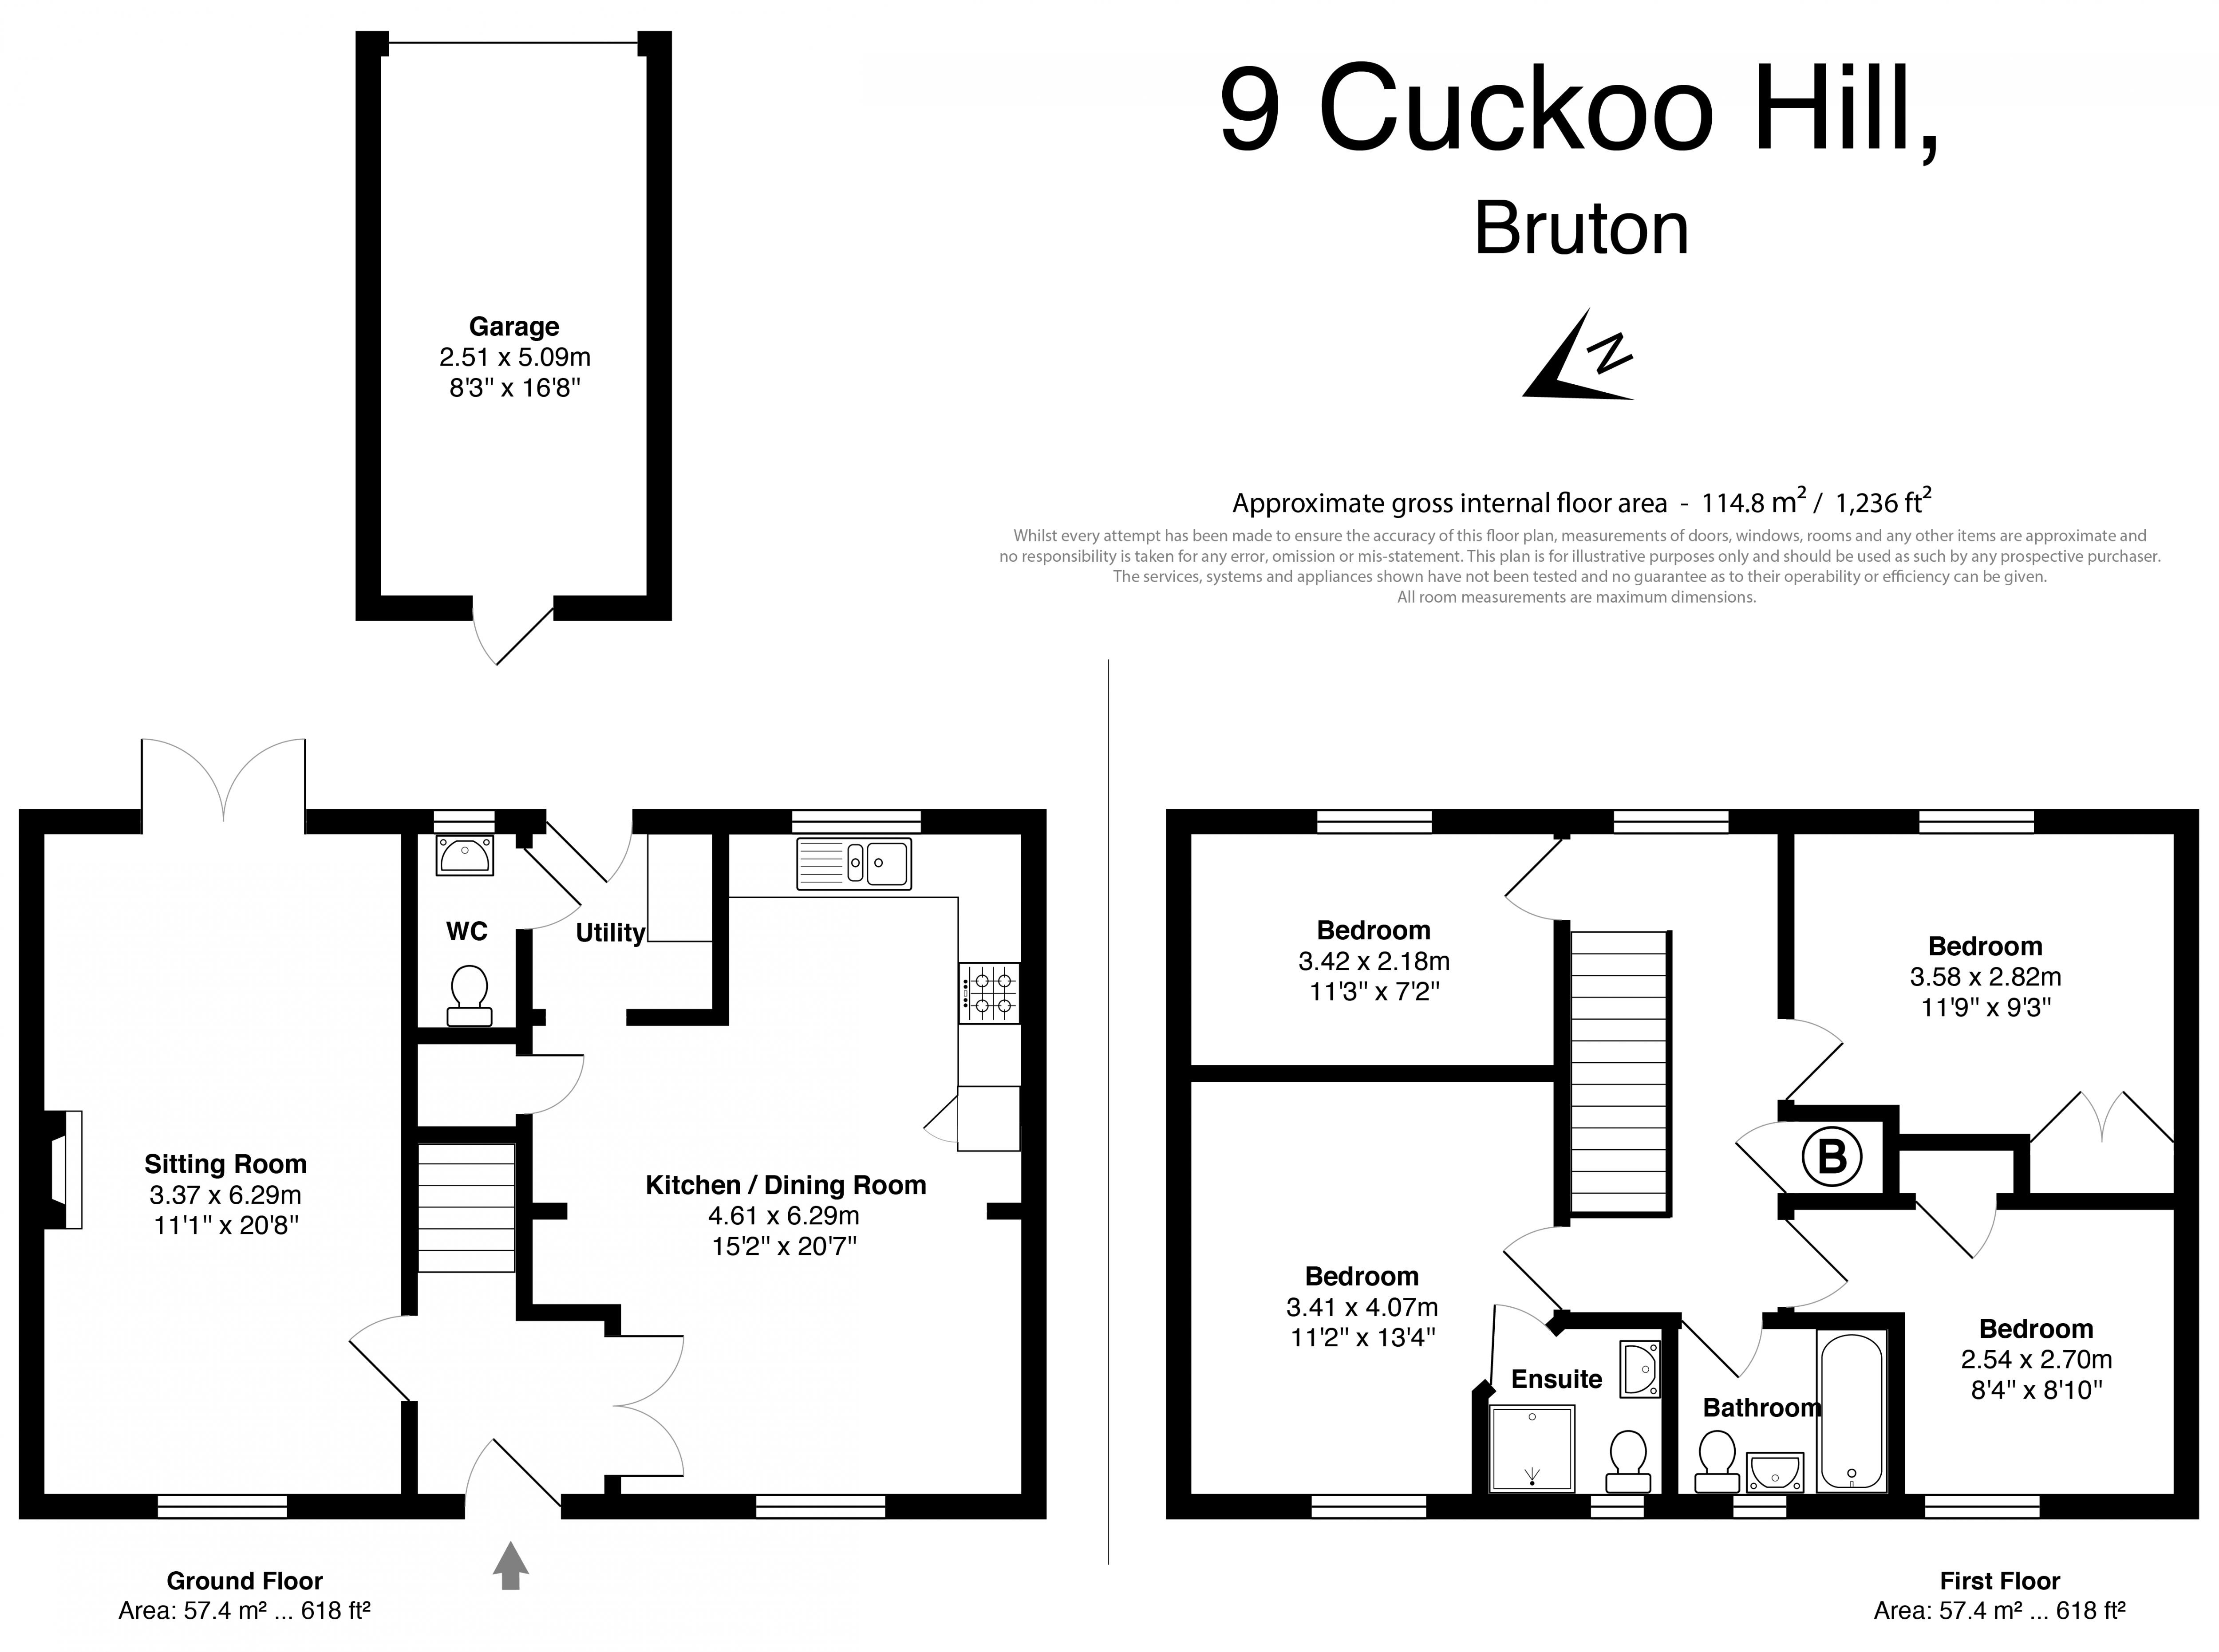 Cuckoo Hill